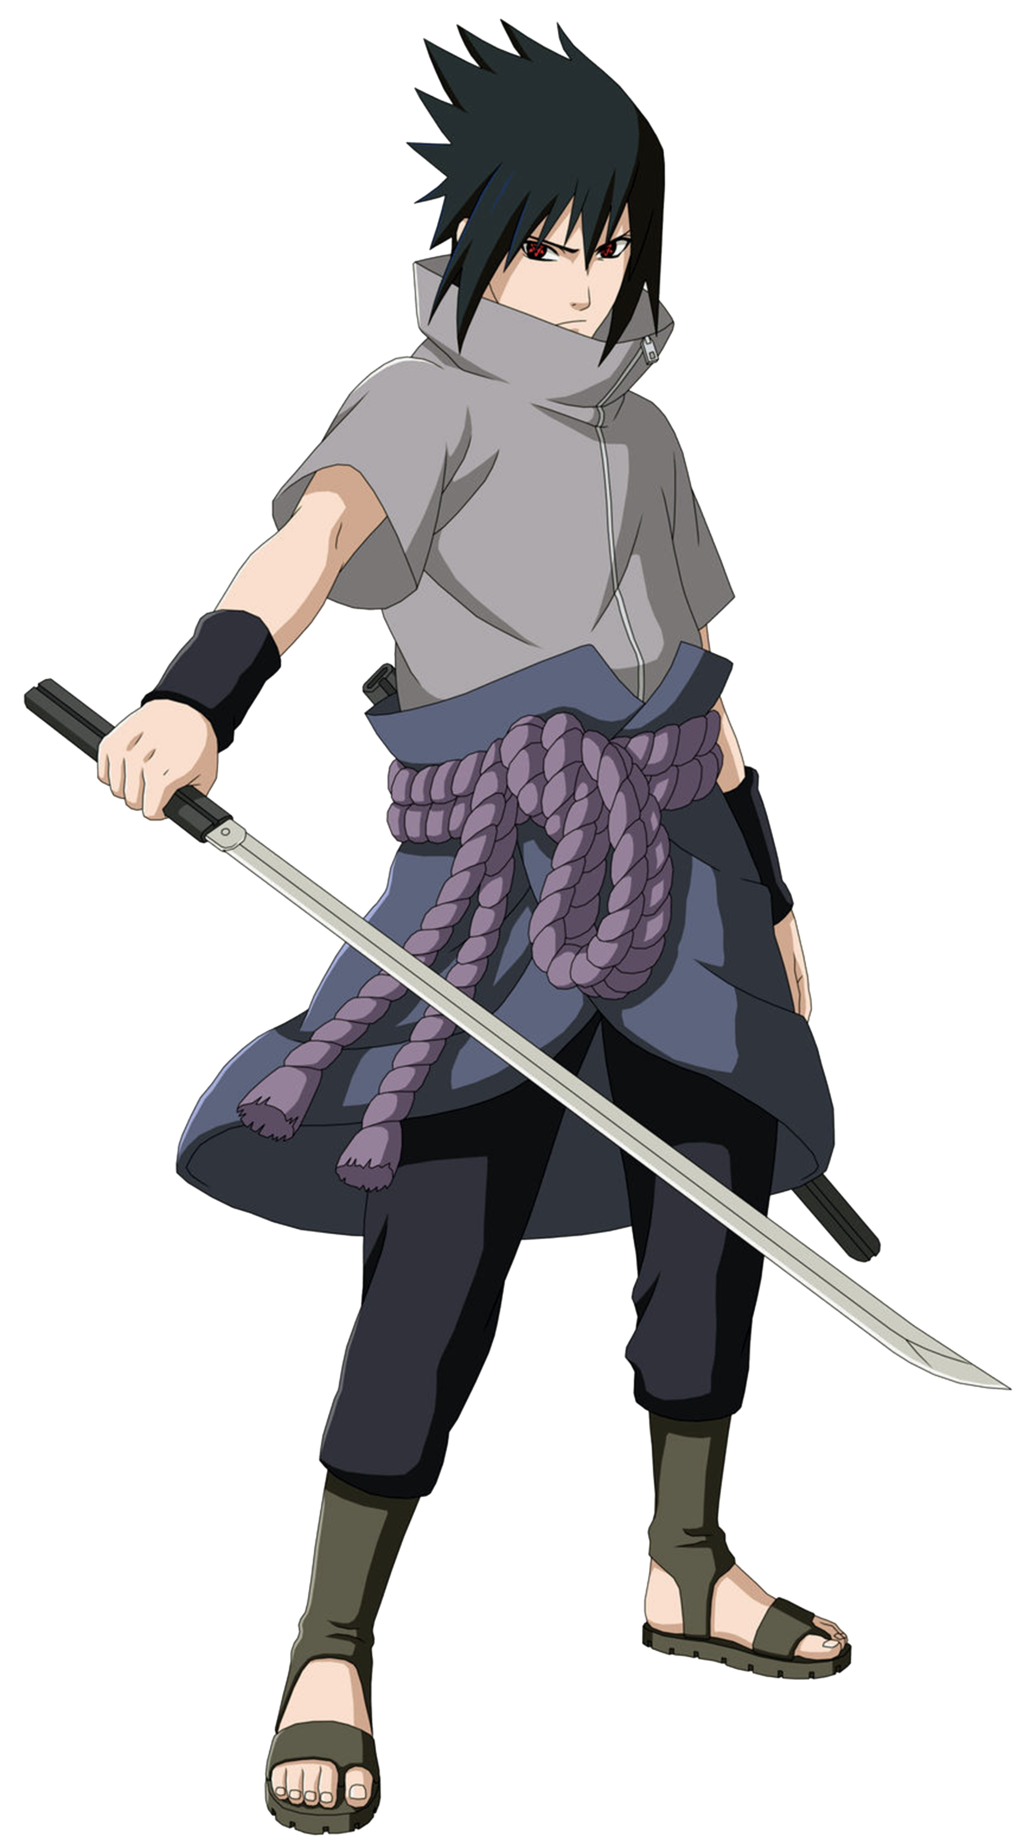 sasuke uchiha | Naruto Images | Pinterest | Naruto, Anime ... - Sasuke Costume